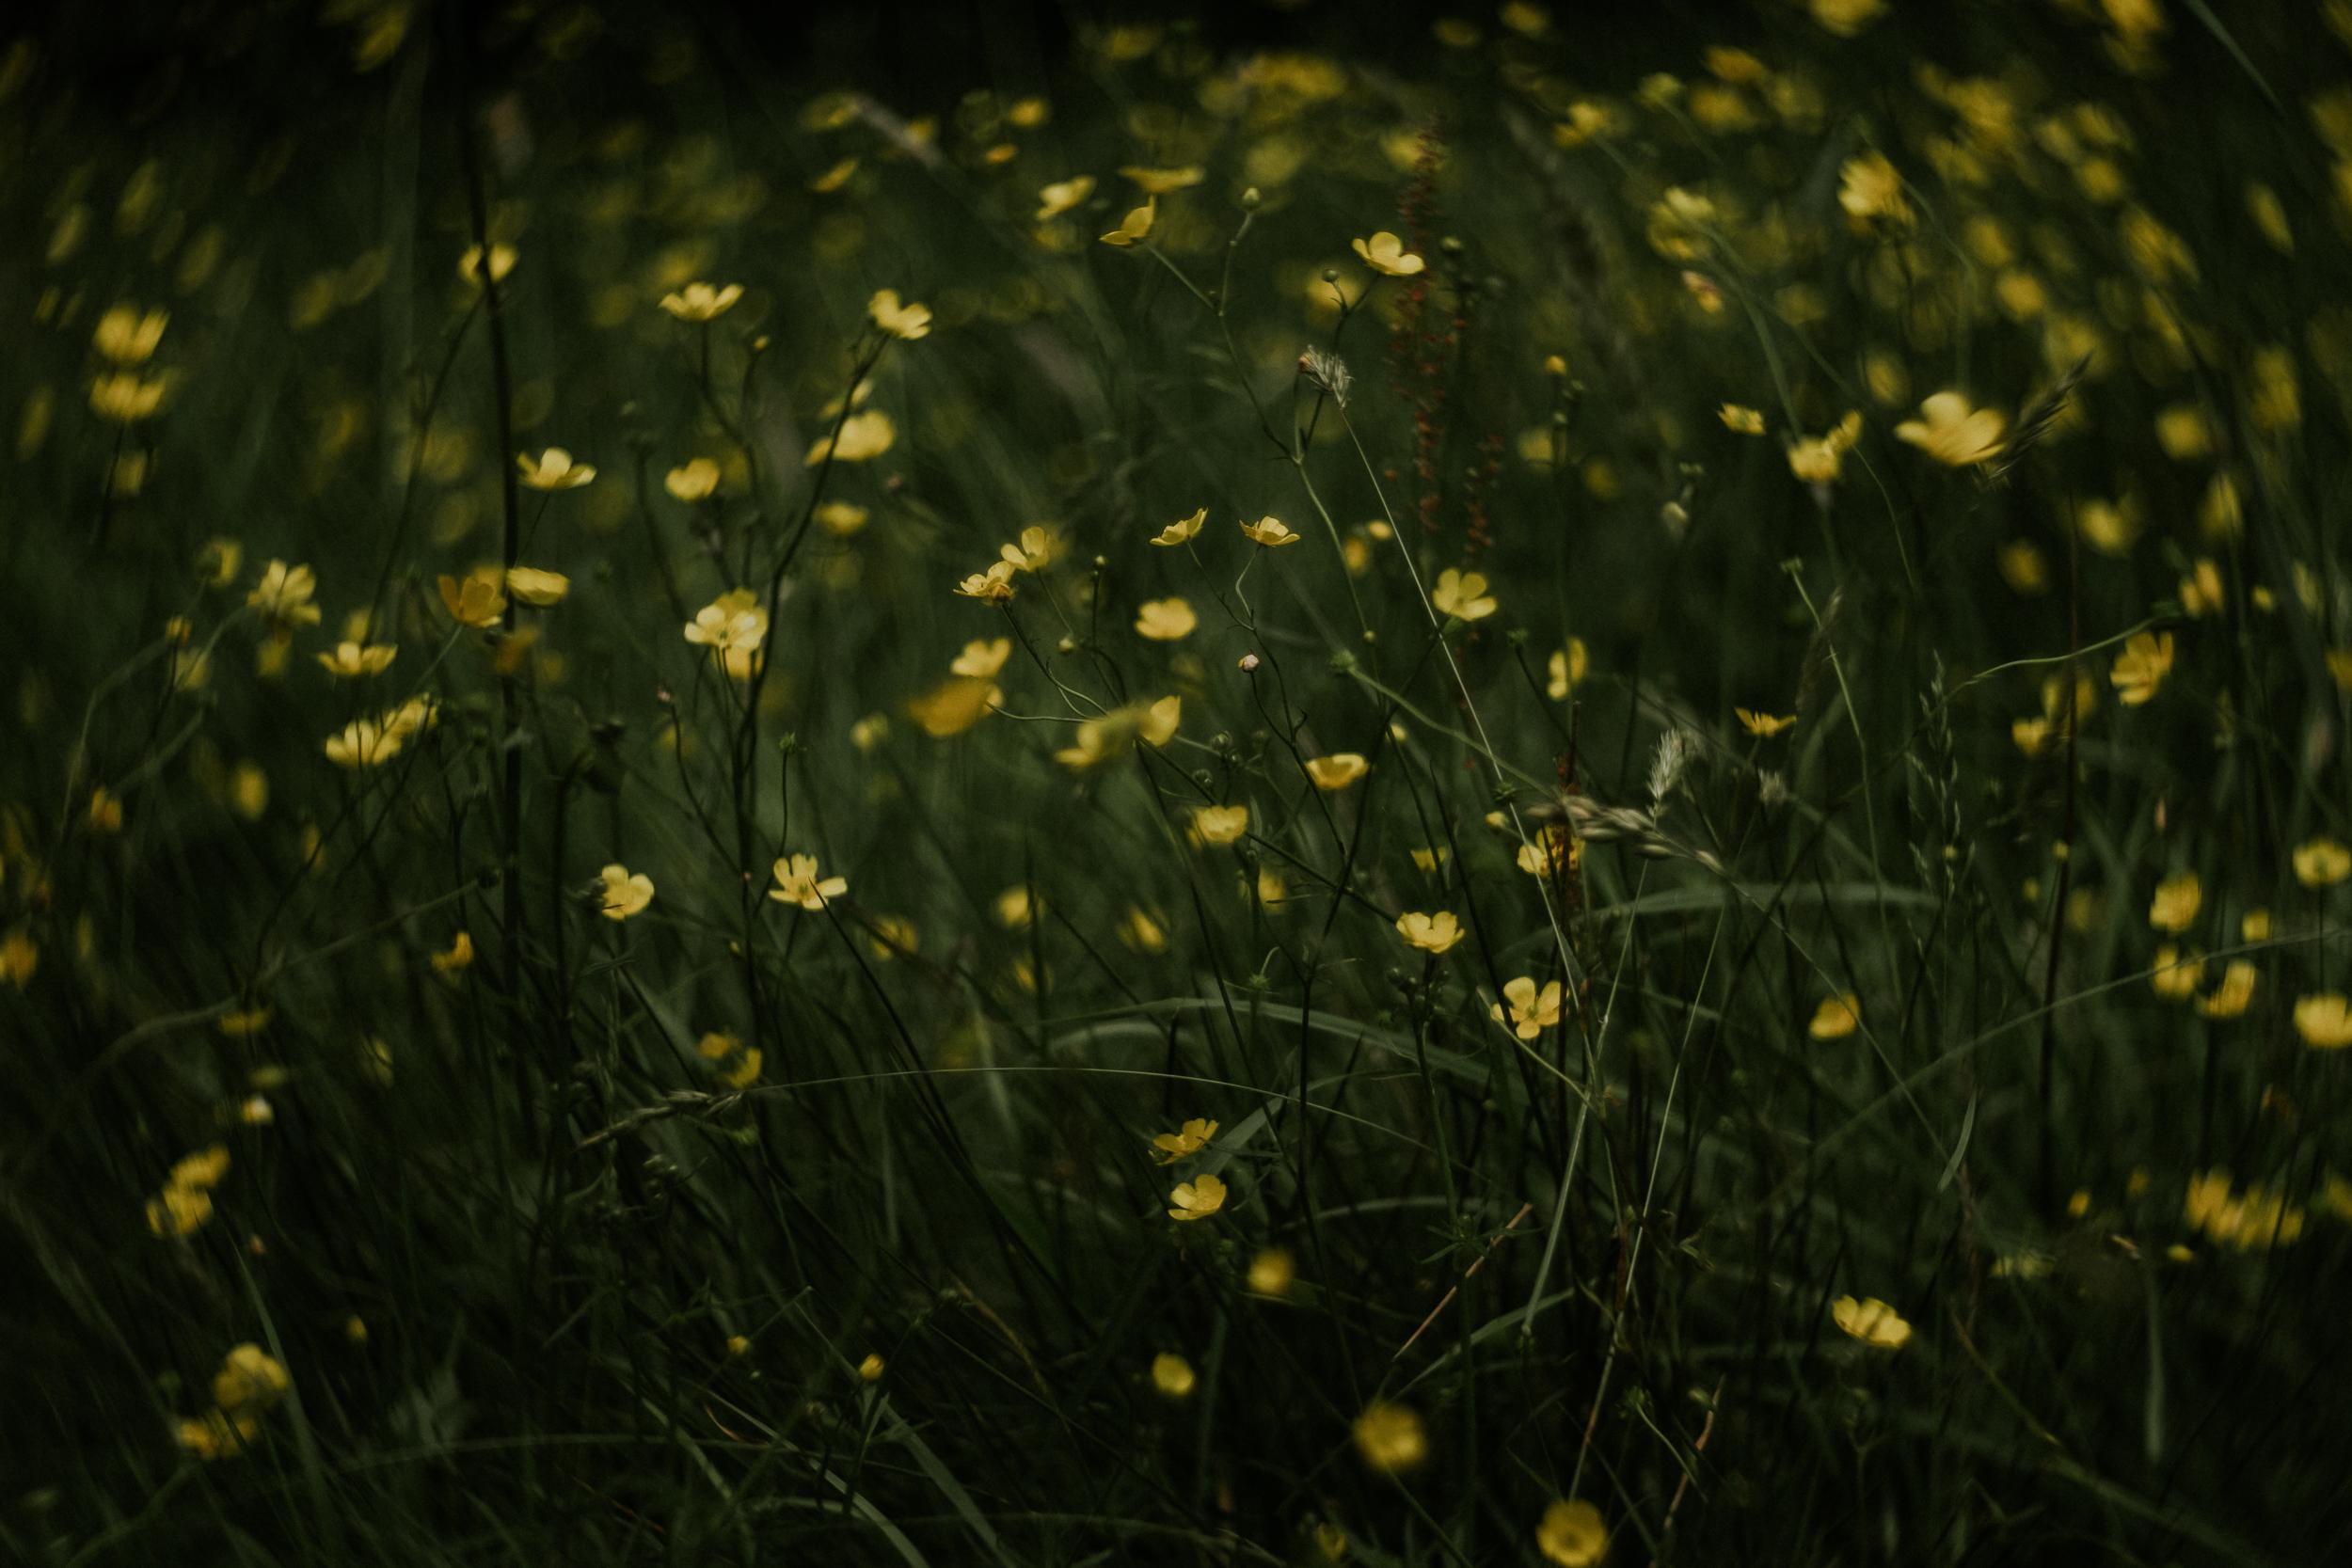 foxandowl.uk_0062.jpg